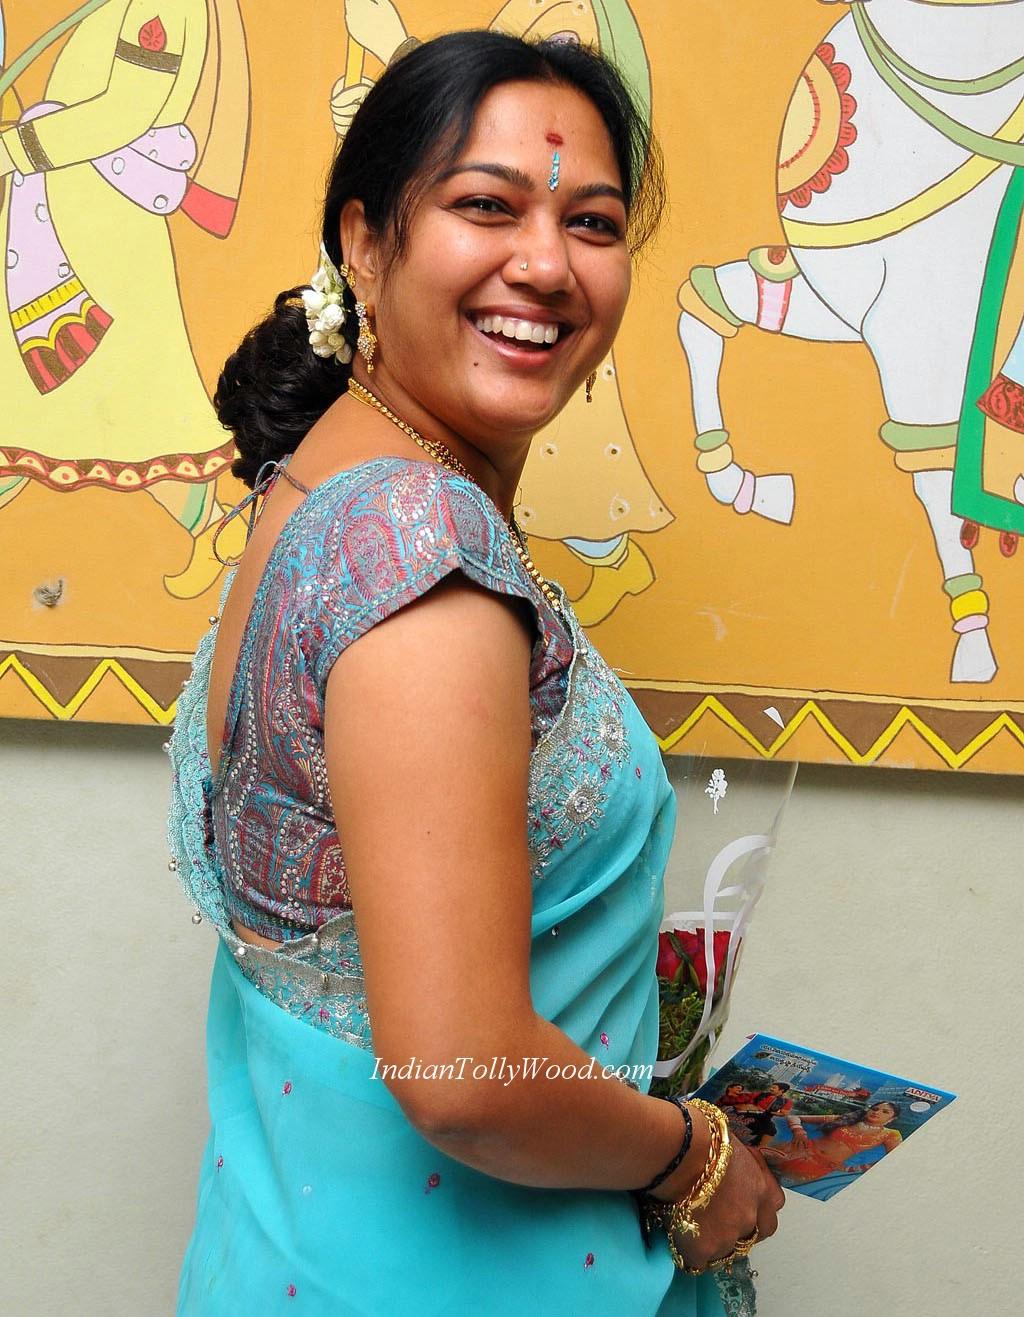 14k gf Rose Gold Rainbow Moonstone Necklace Full Telugu female character artists photos